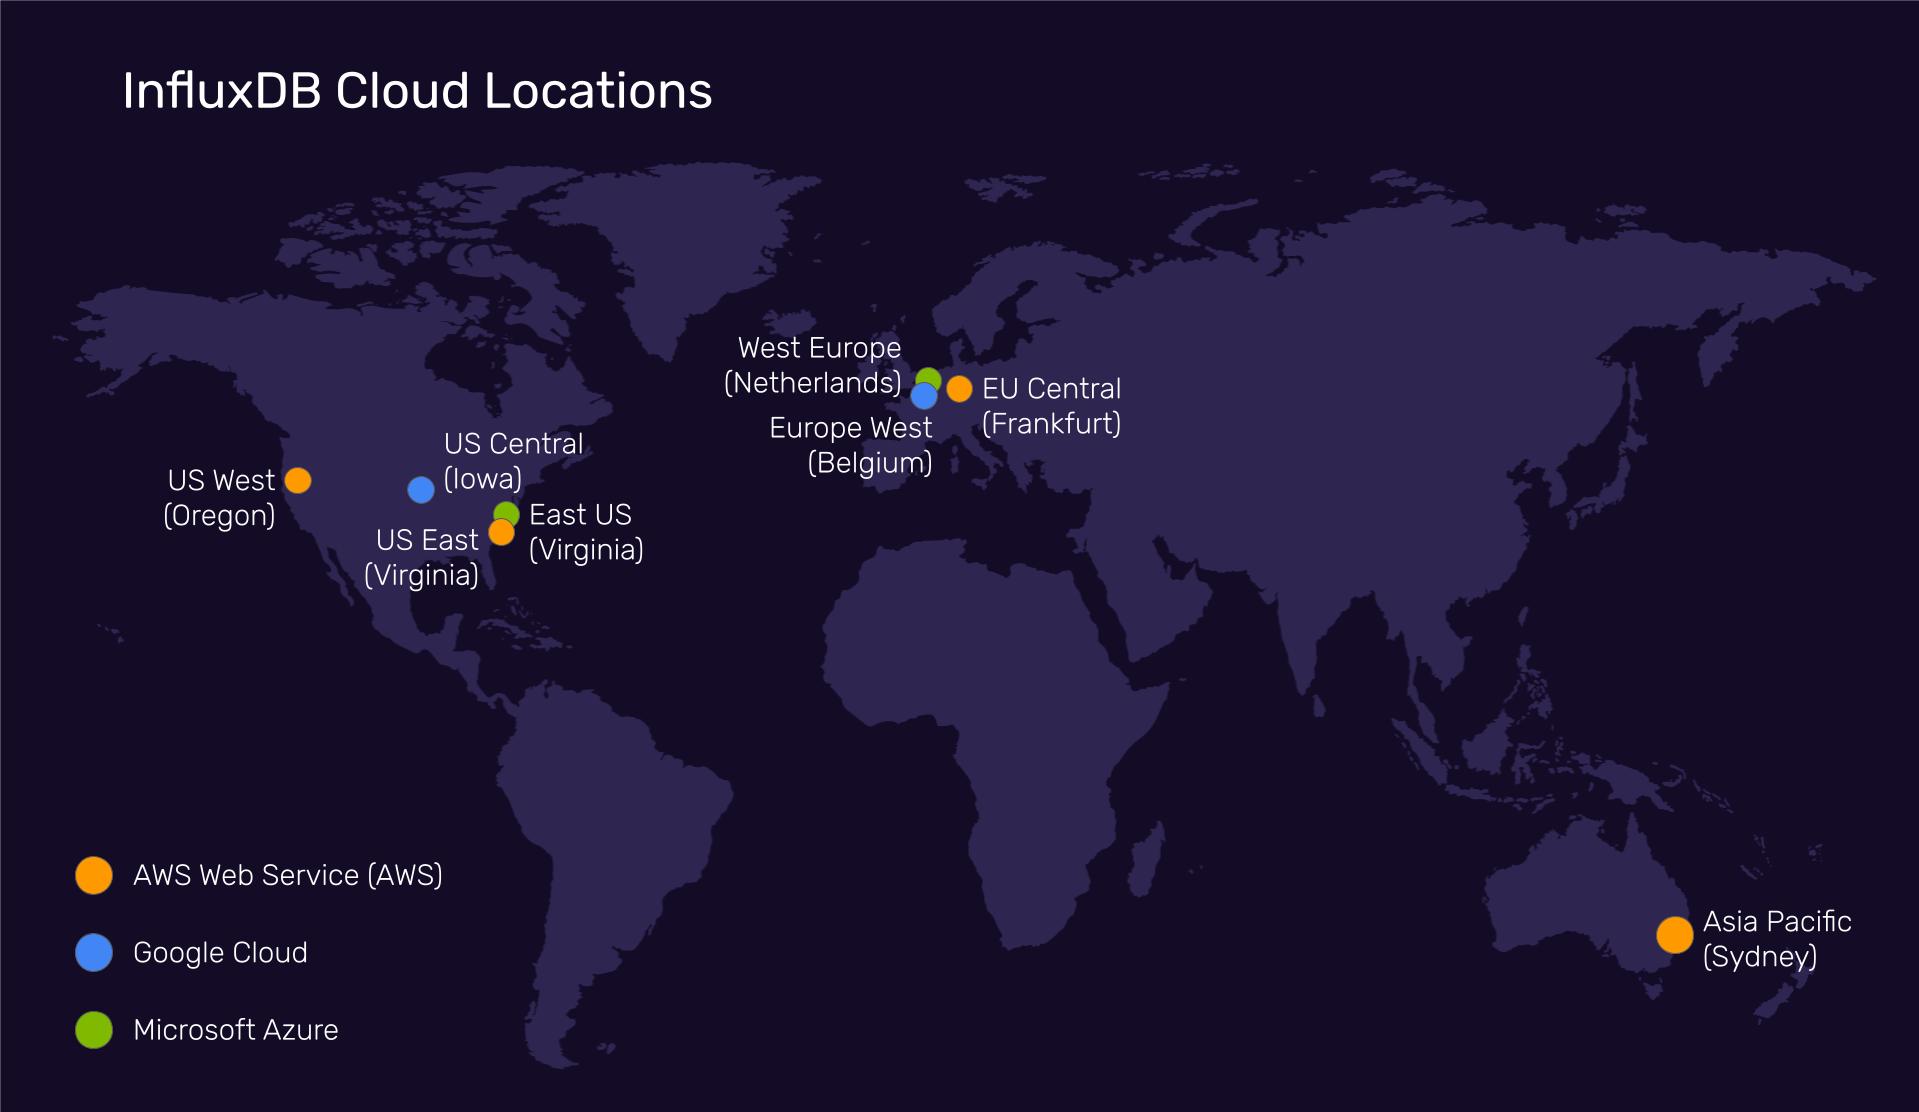 InfluxDB Cloud Locations Map